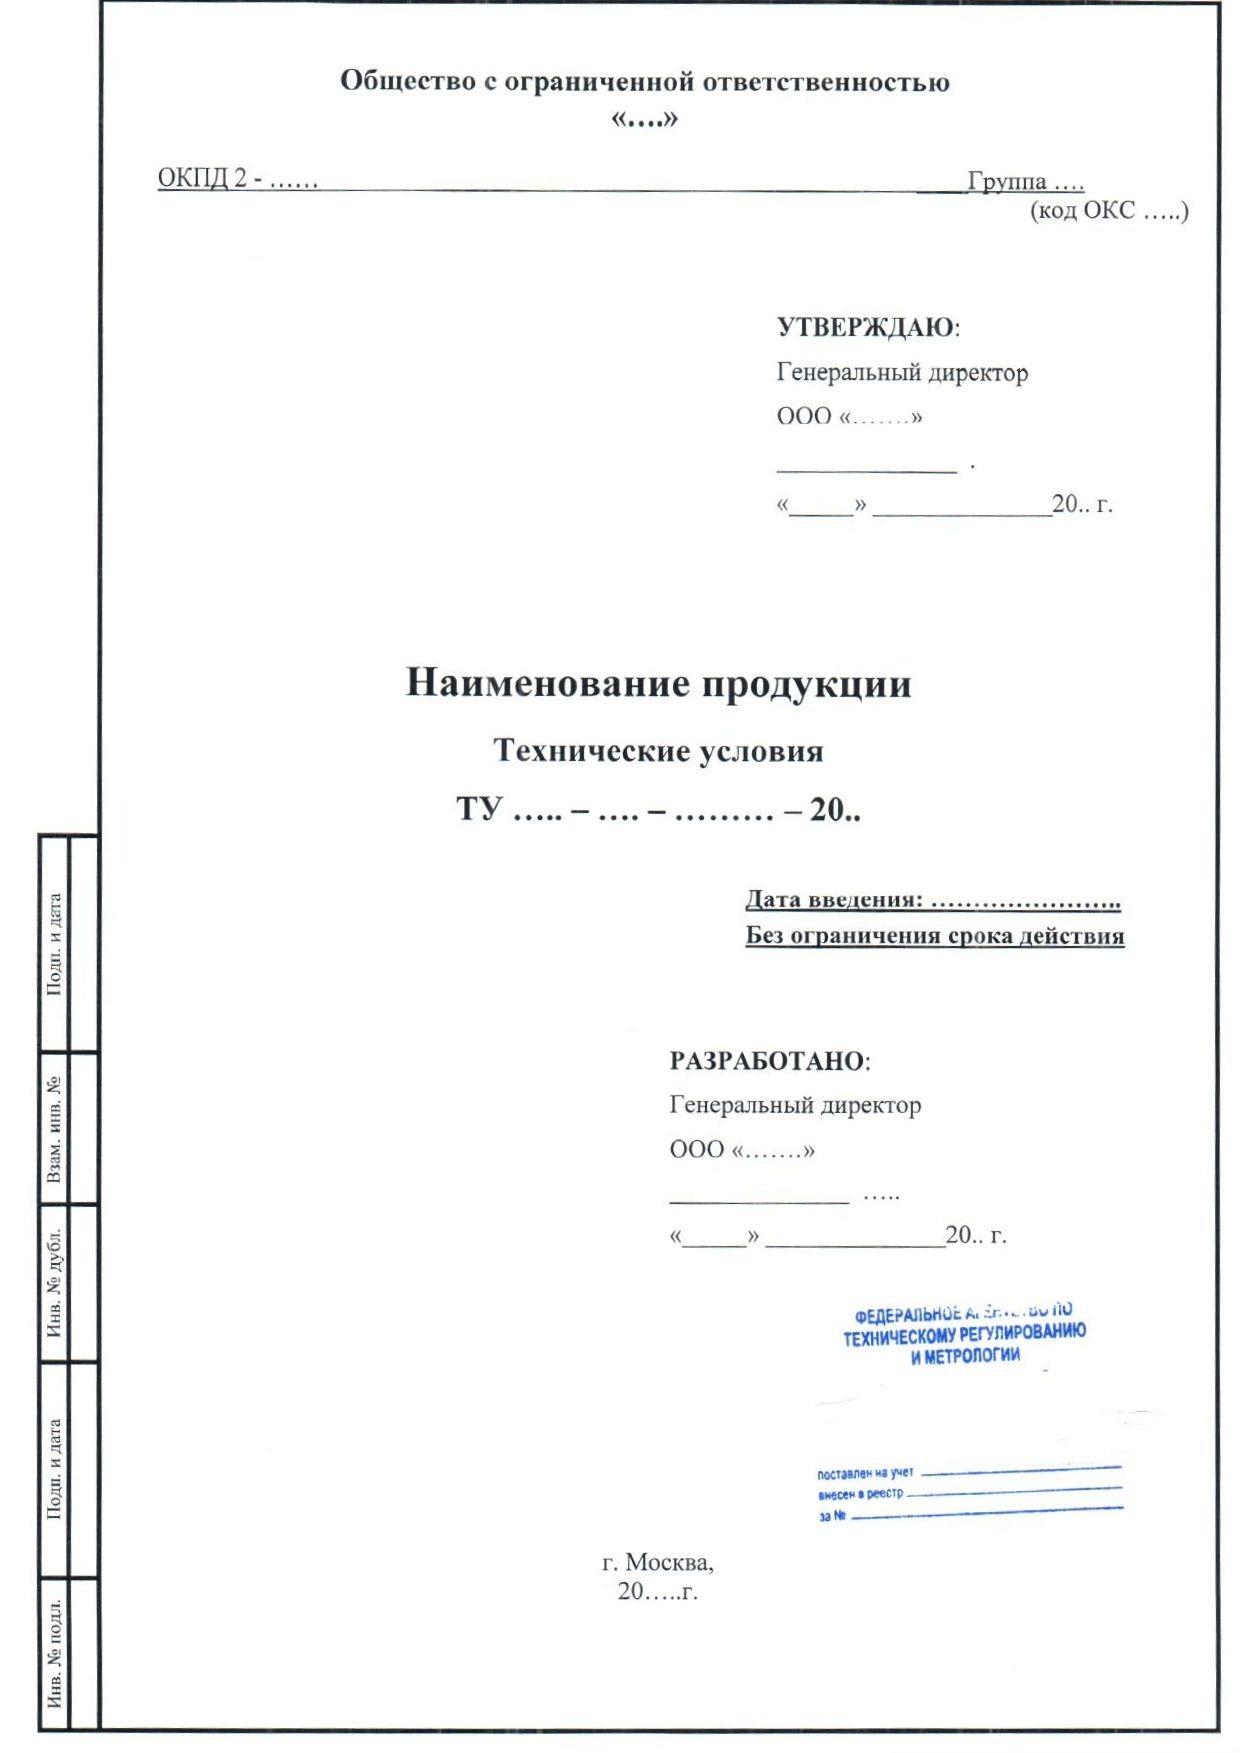 Регистрация технических условий (ТУ)